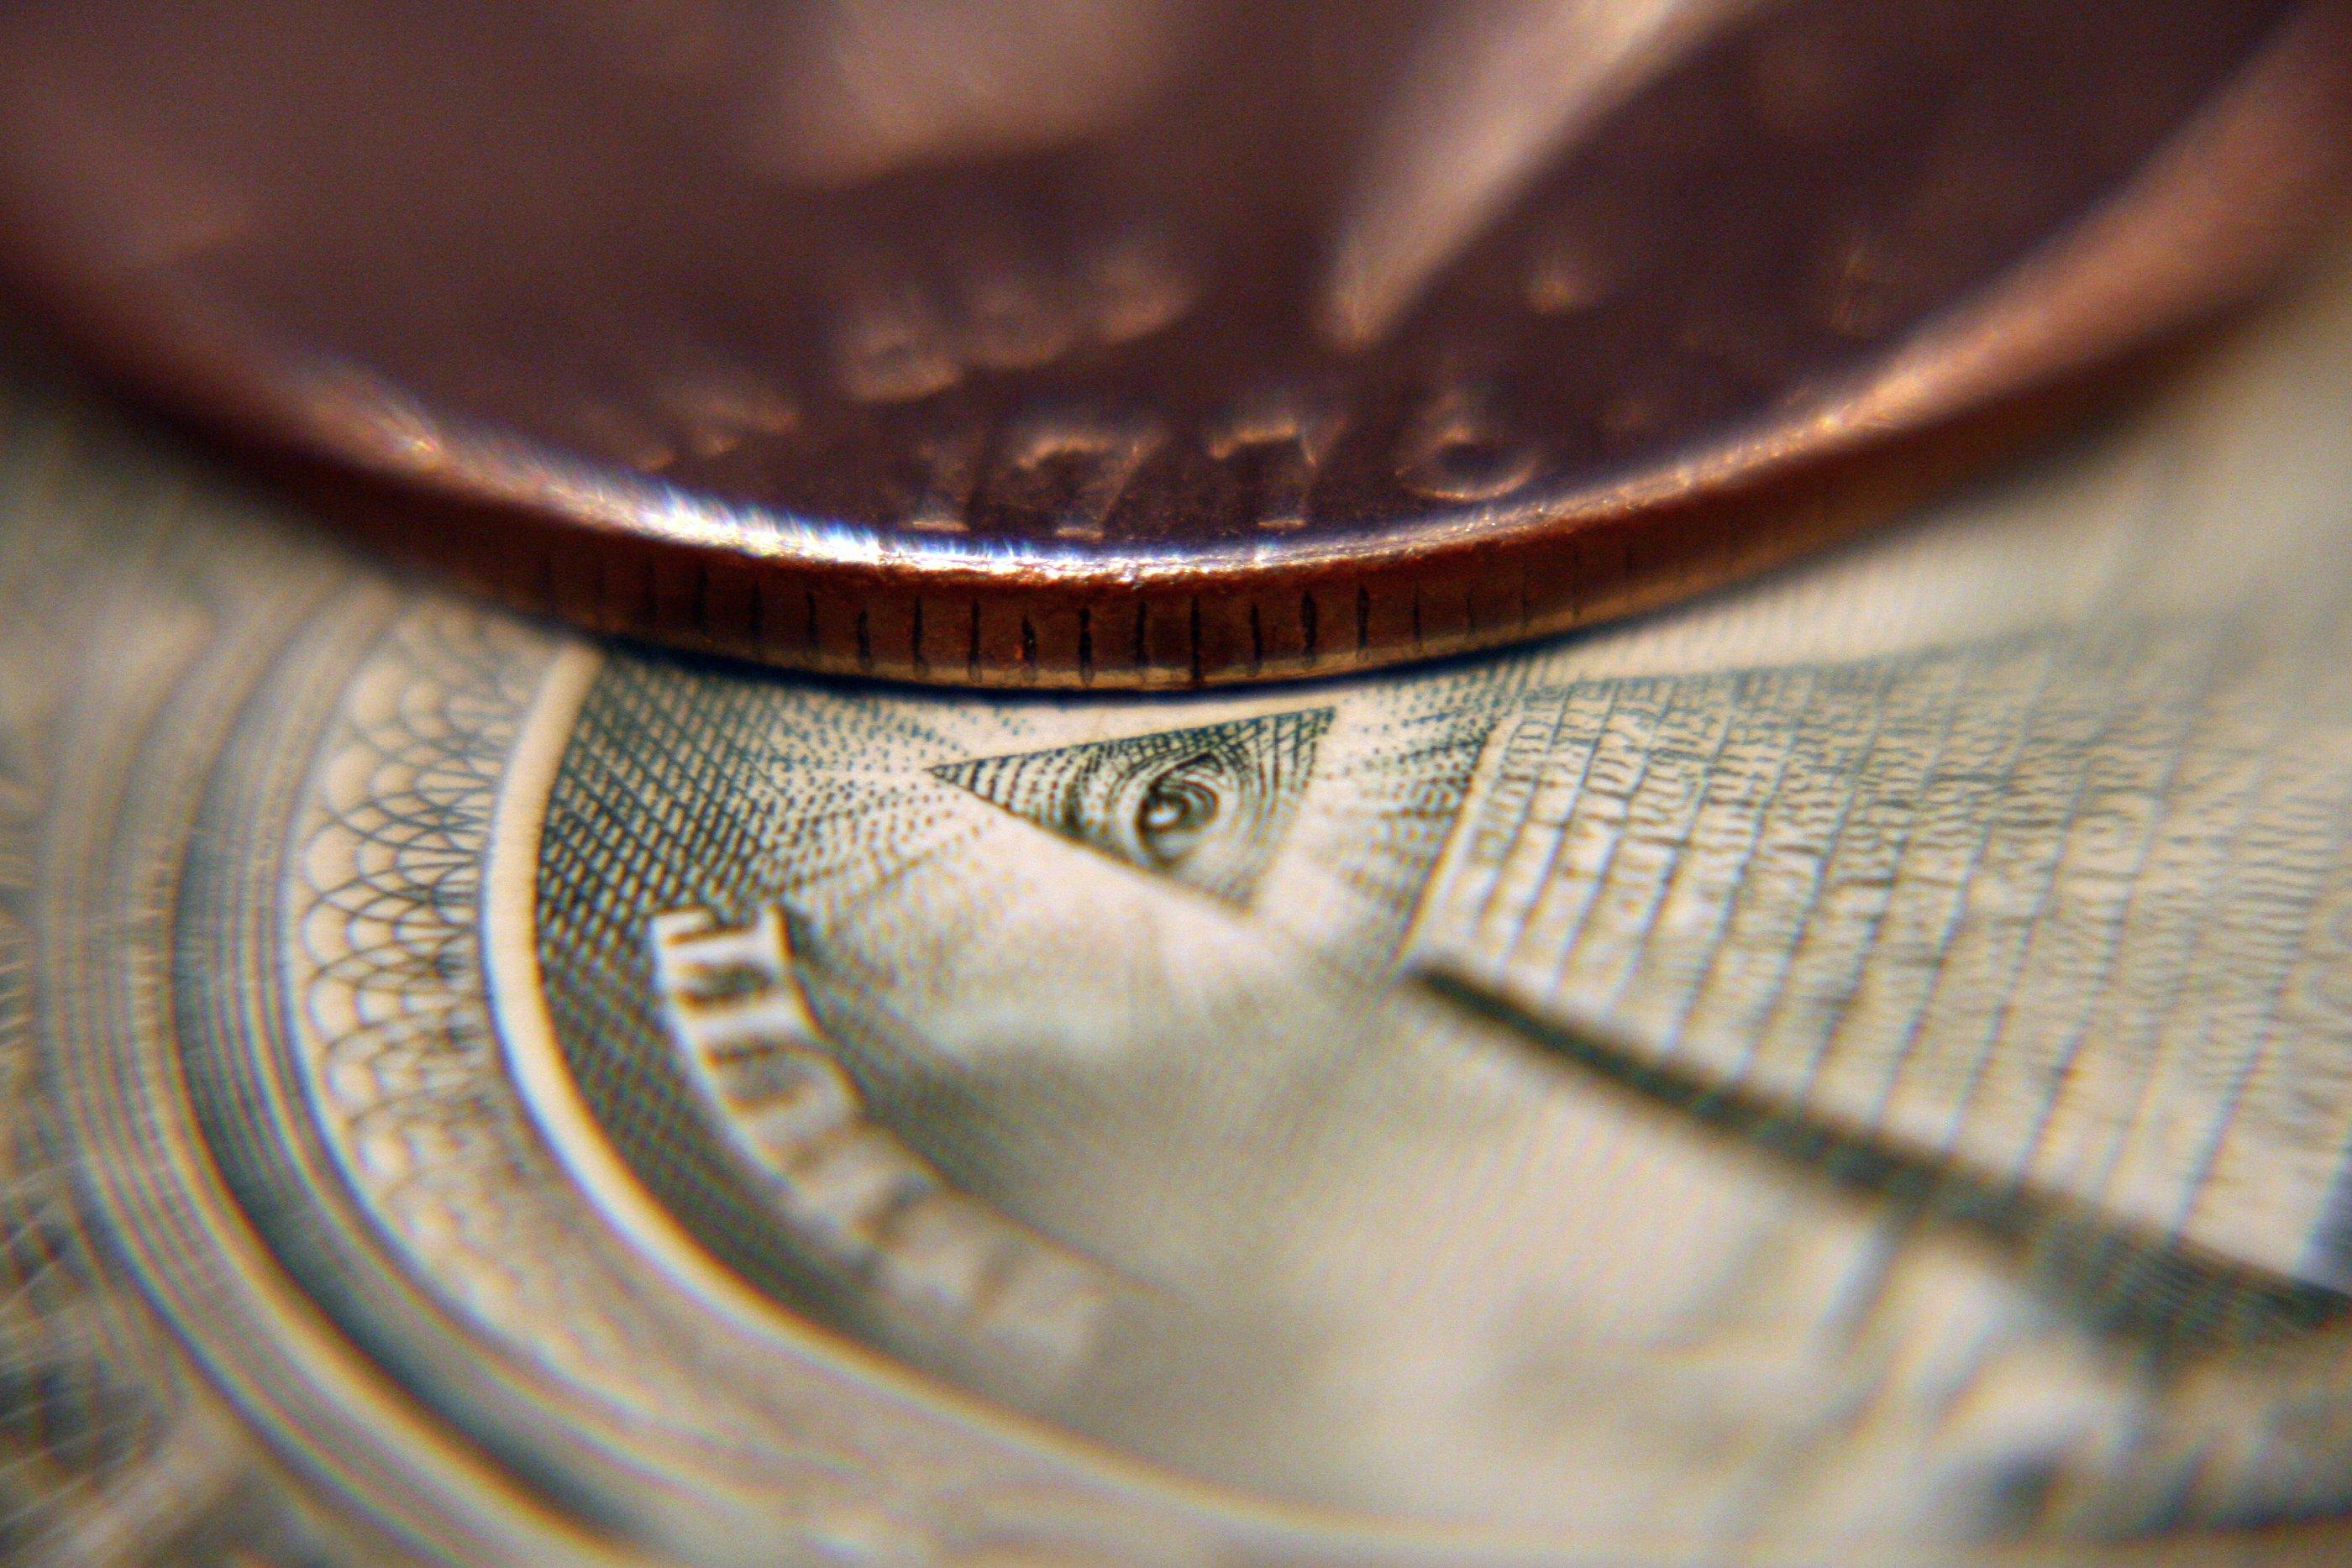 files/images/US-money.jpg